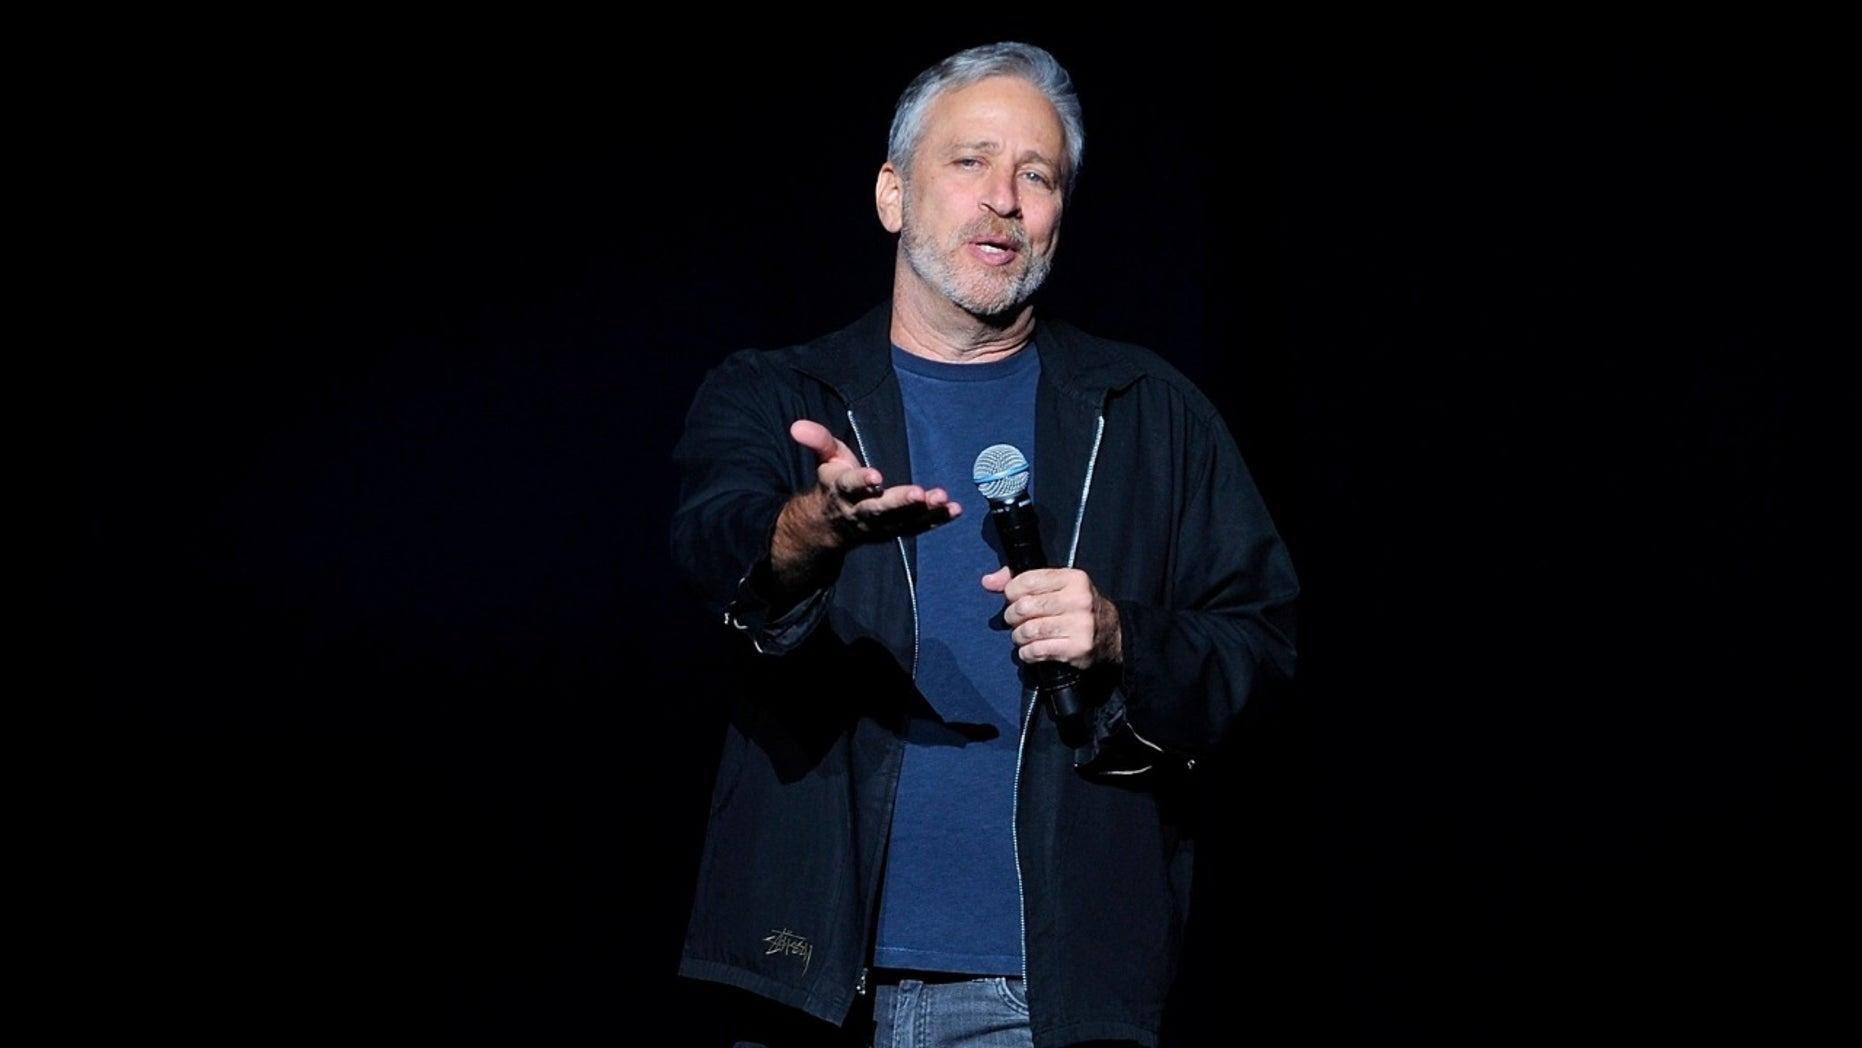 Comedian Jon Stewart discusses gun control at a benefit on Monday, Nov. 5, 2018.